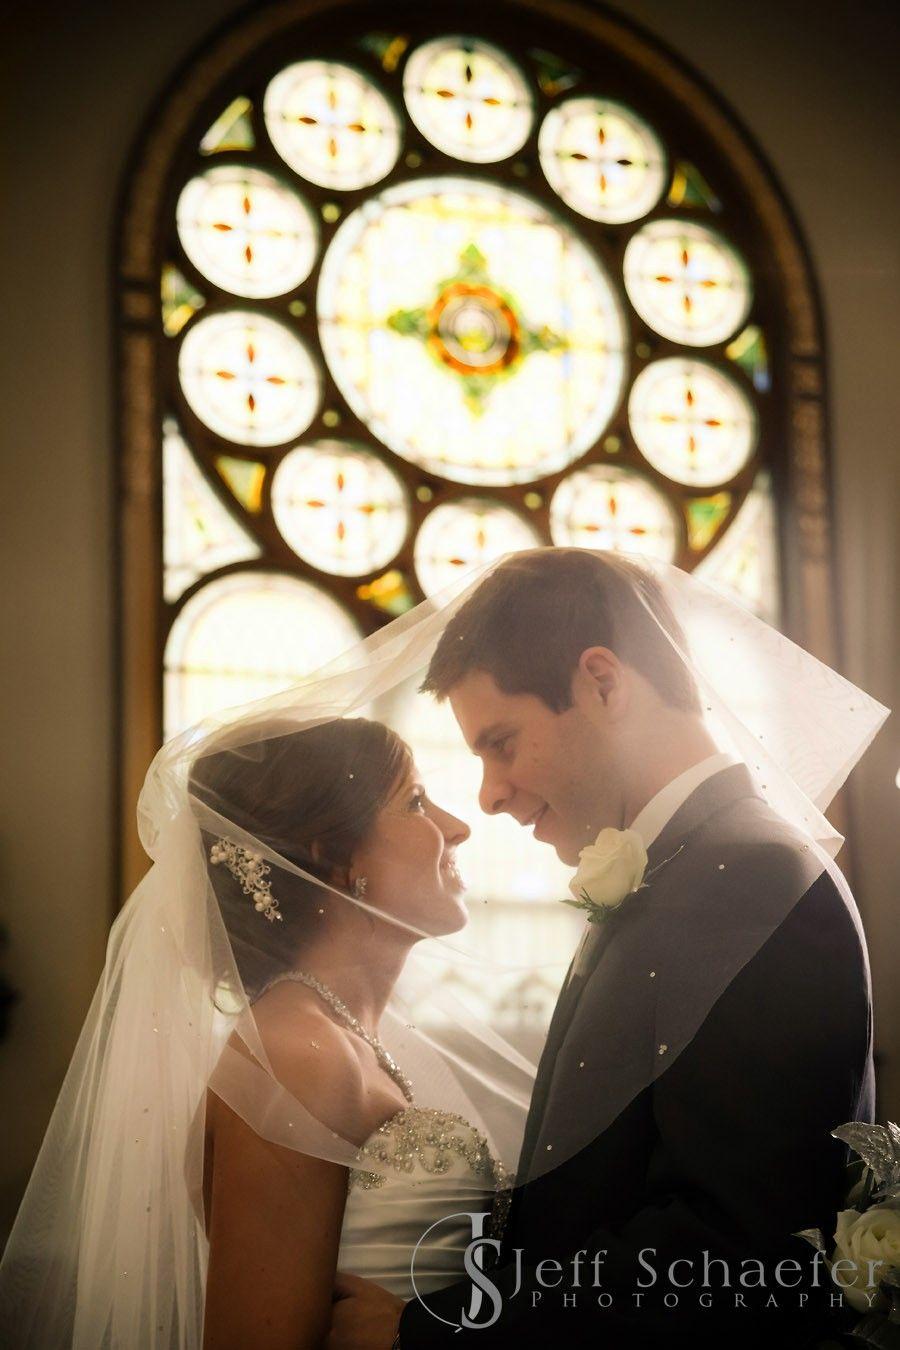 St Benedict S Church Cincinnati Wedding Photographers Jeff Schaefer Photogra In 2020 Cincinnati Wedding Photographers Cincinnati Weddings Church Wedding Photography